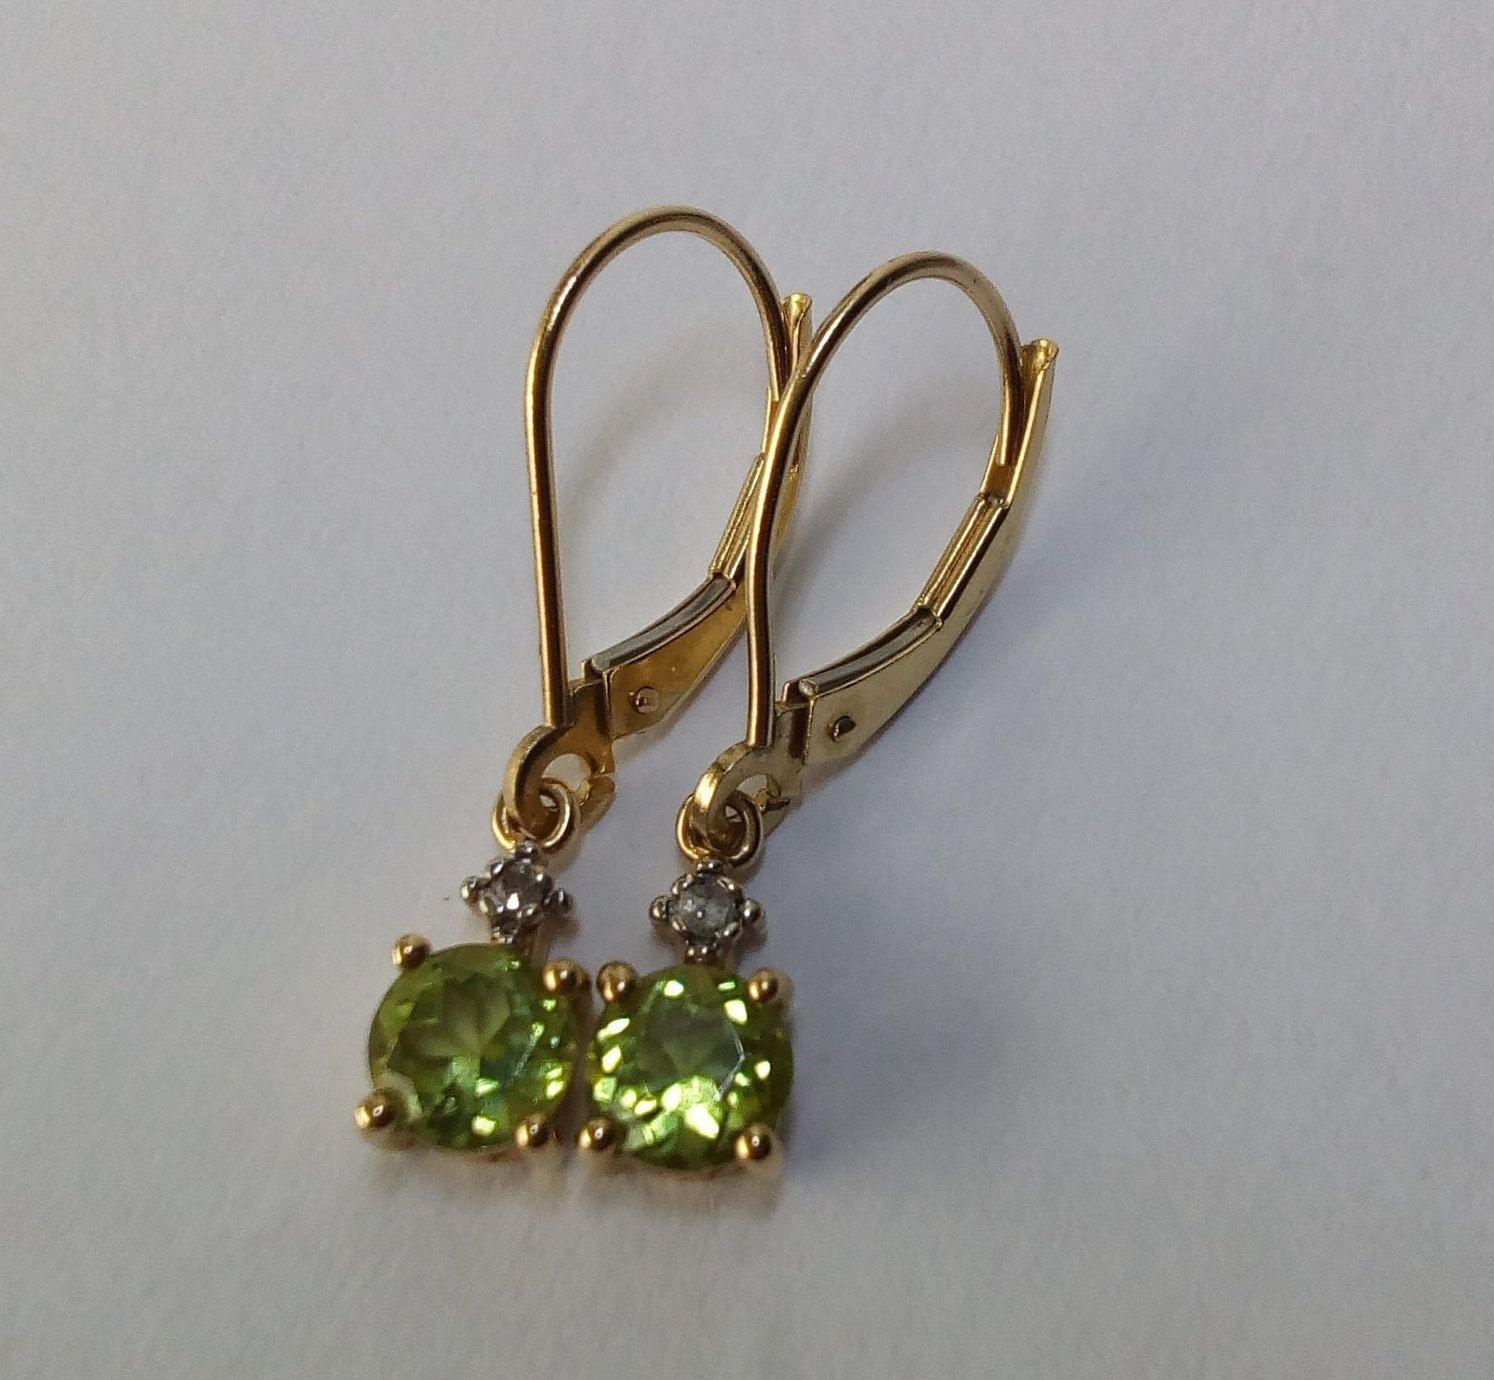 10k White Gold 5mm Round Genuine Pink Topaz Lever-back Earrings